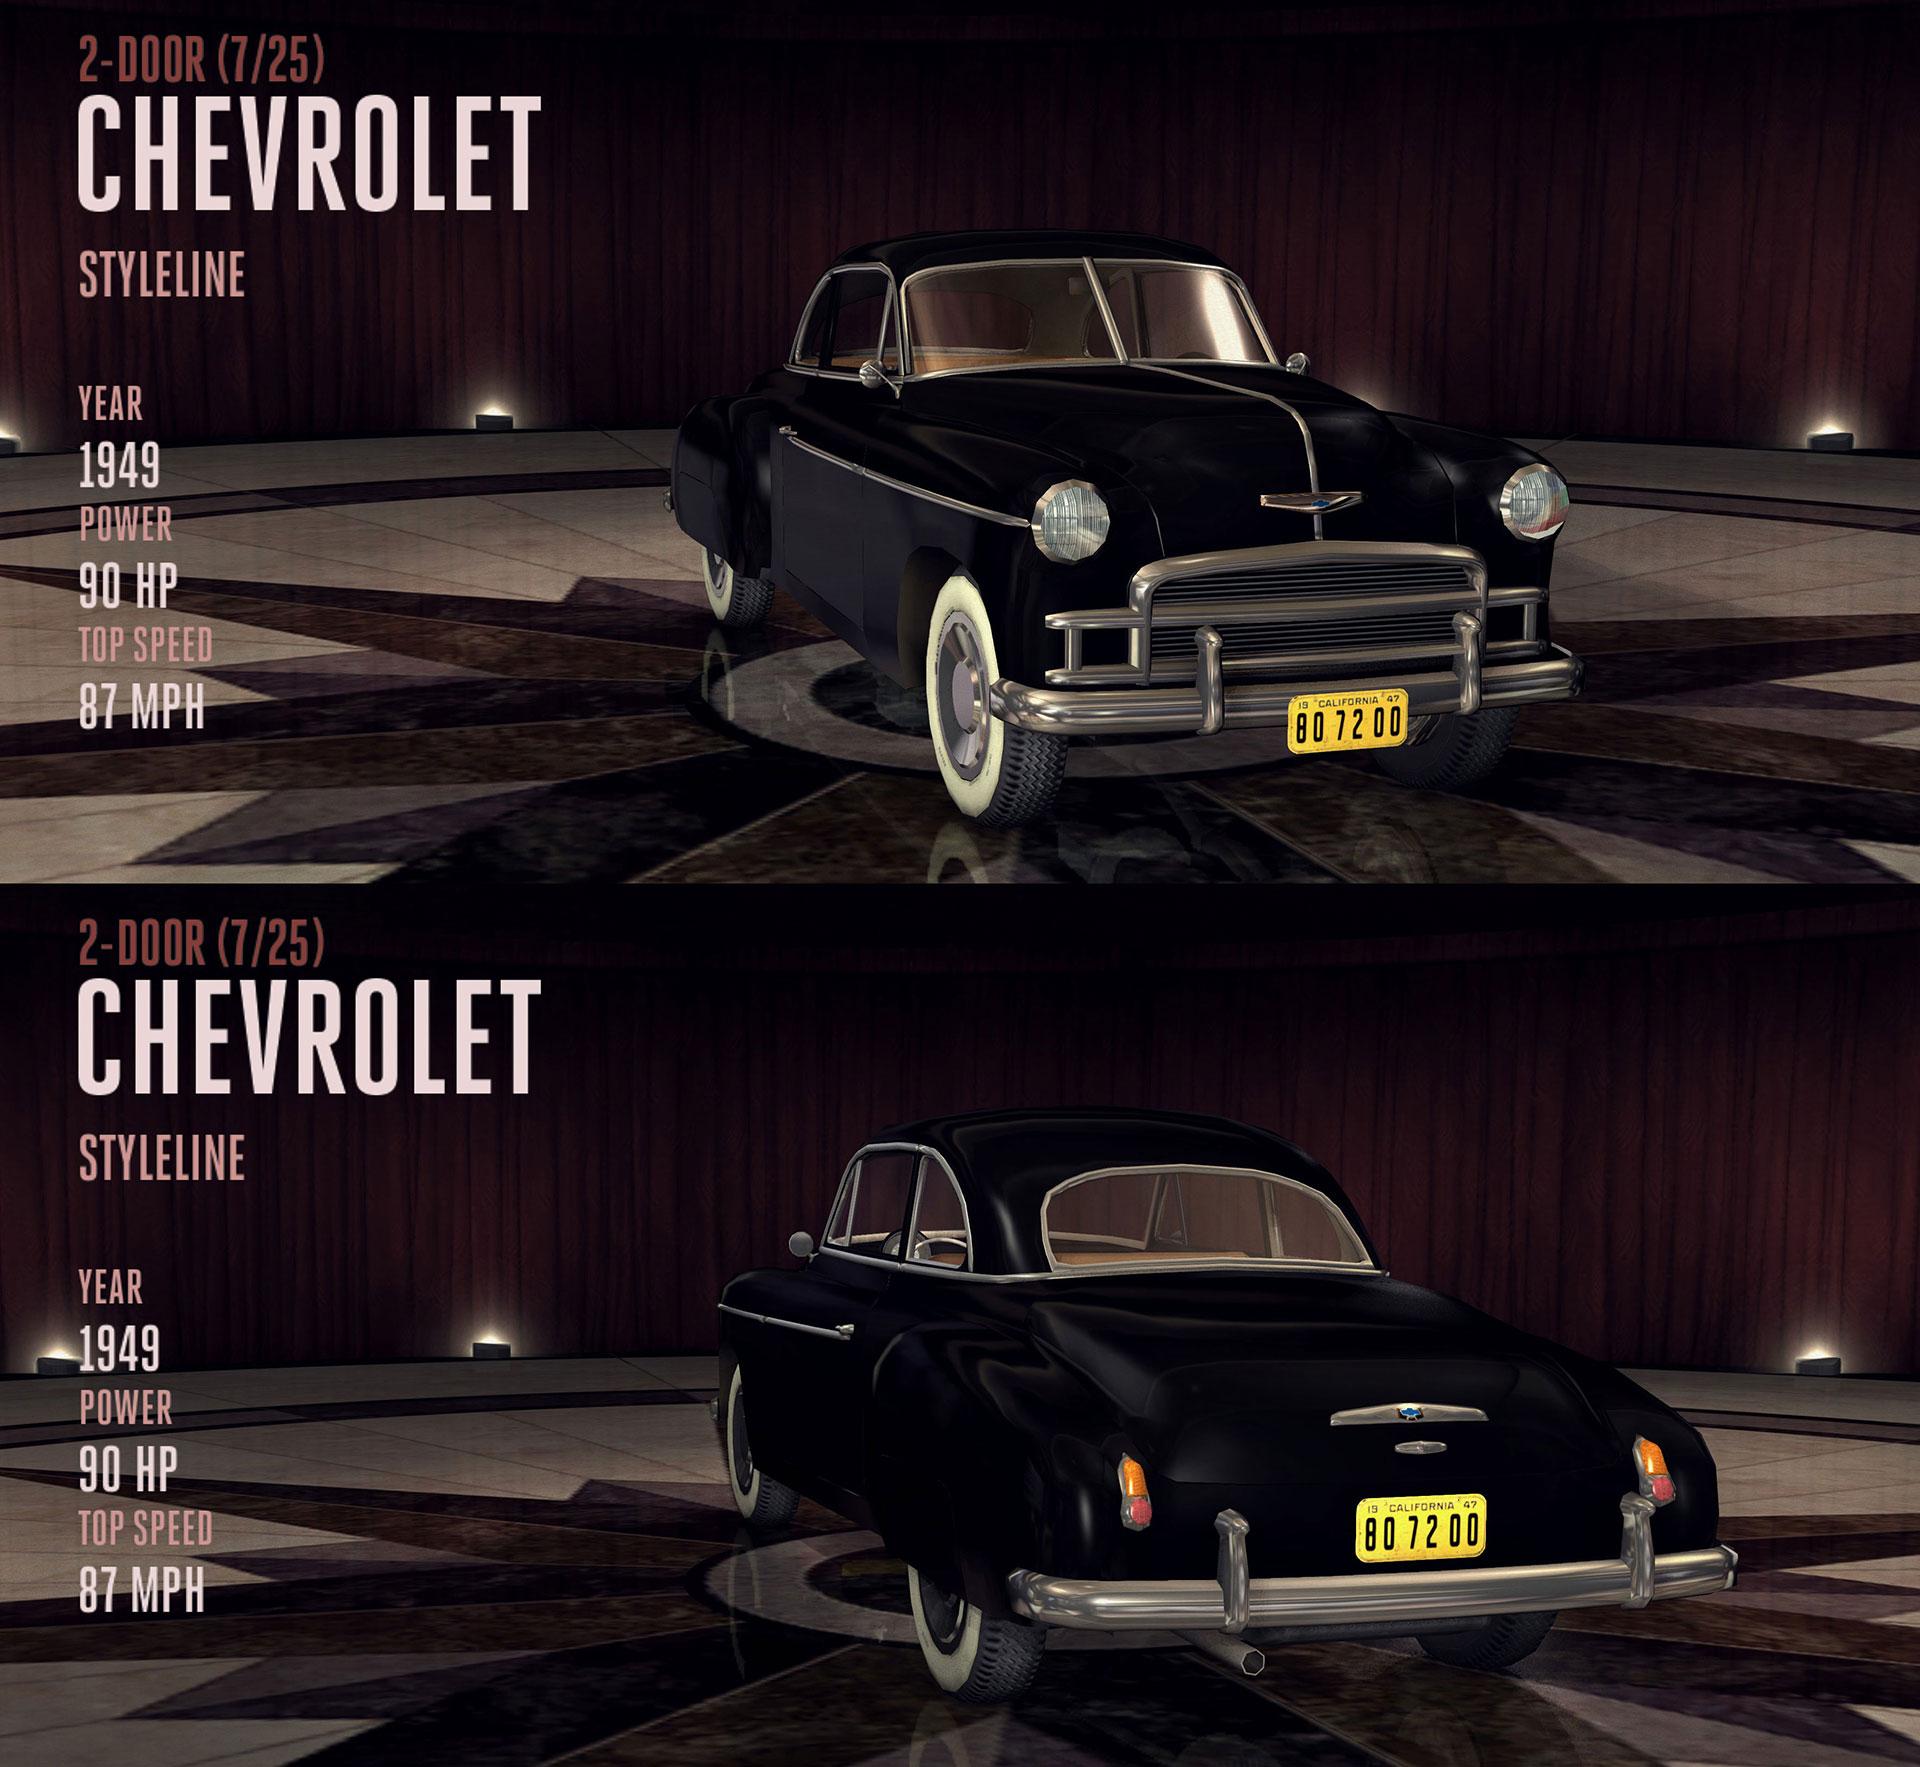 Chevrolet Styleline